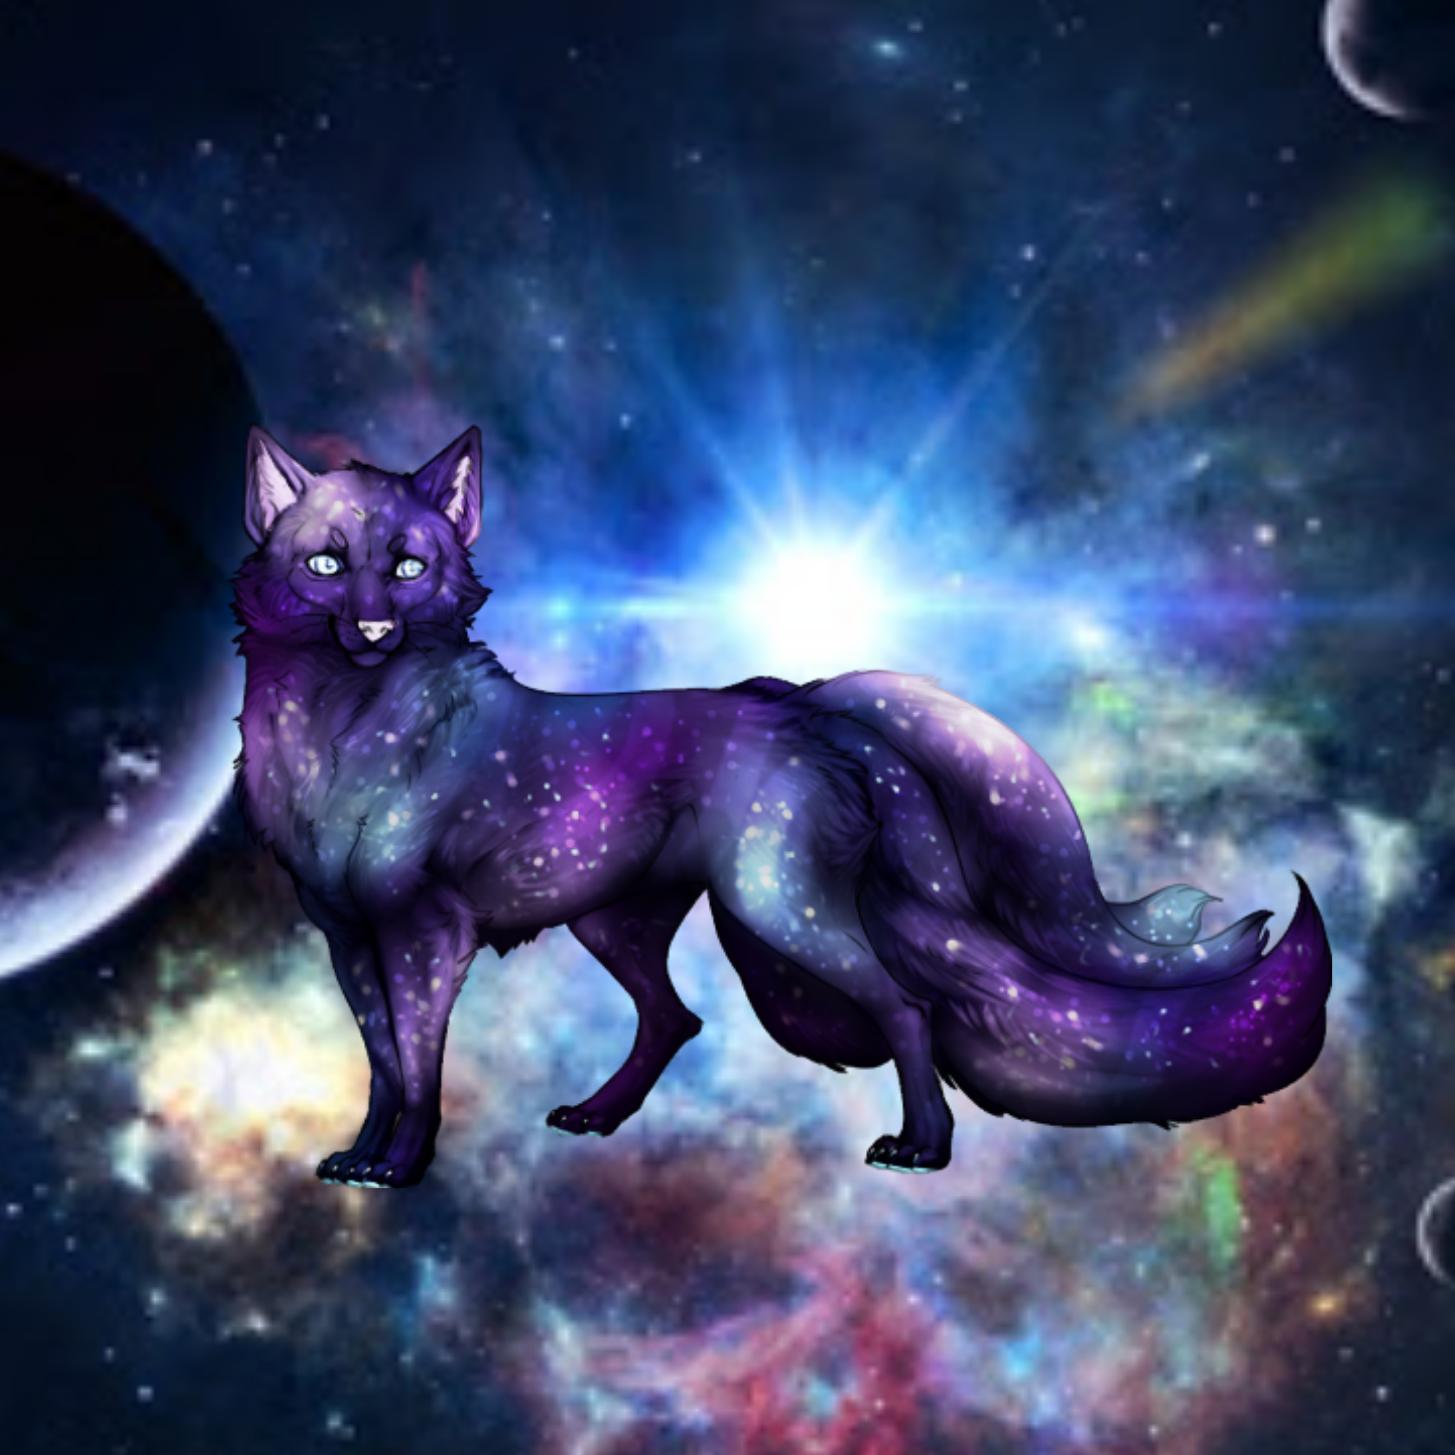 Image By Galaxy Wolf